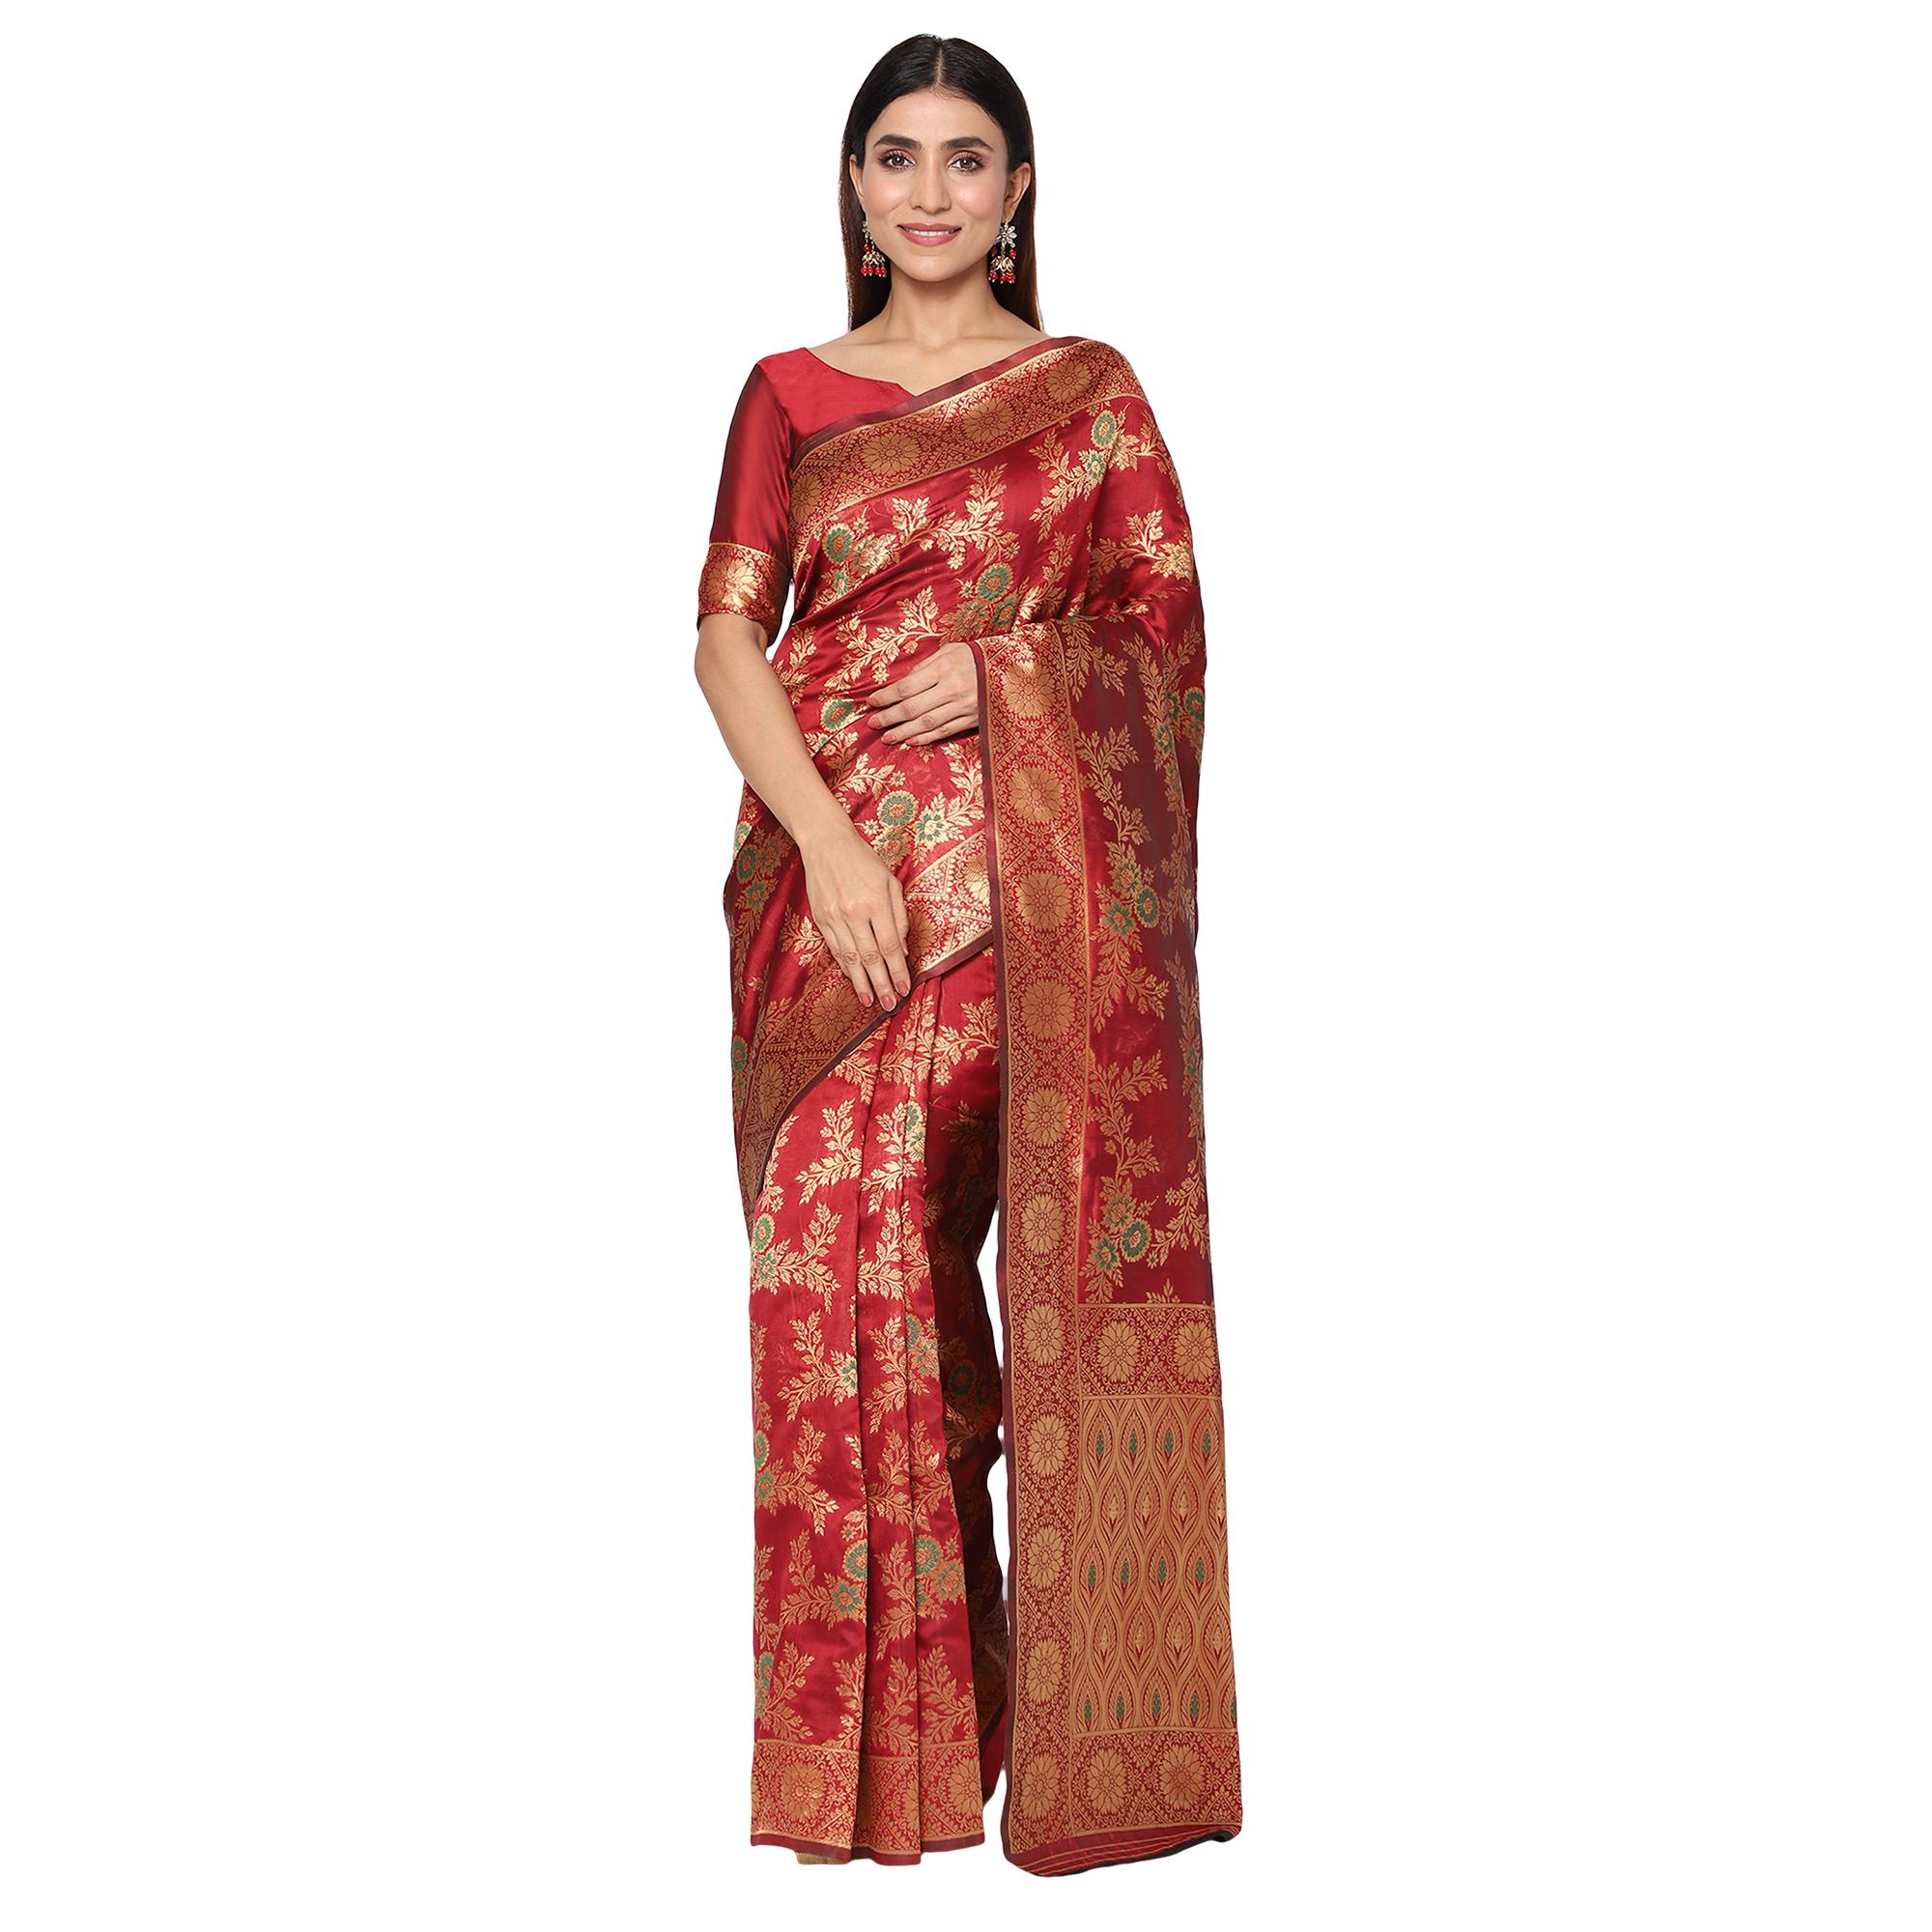 Glemora | Glemora Maroon Designer Ethnic Wear Silk Blend Banarasi Traditional Saree